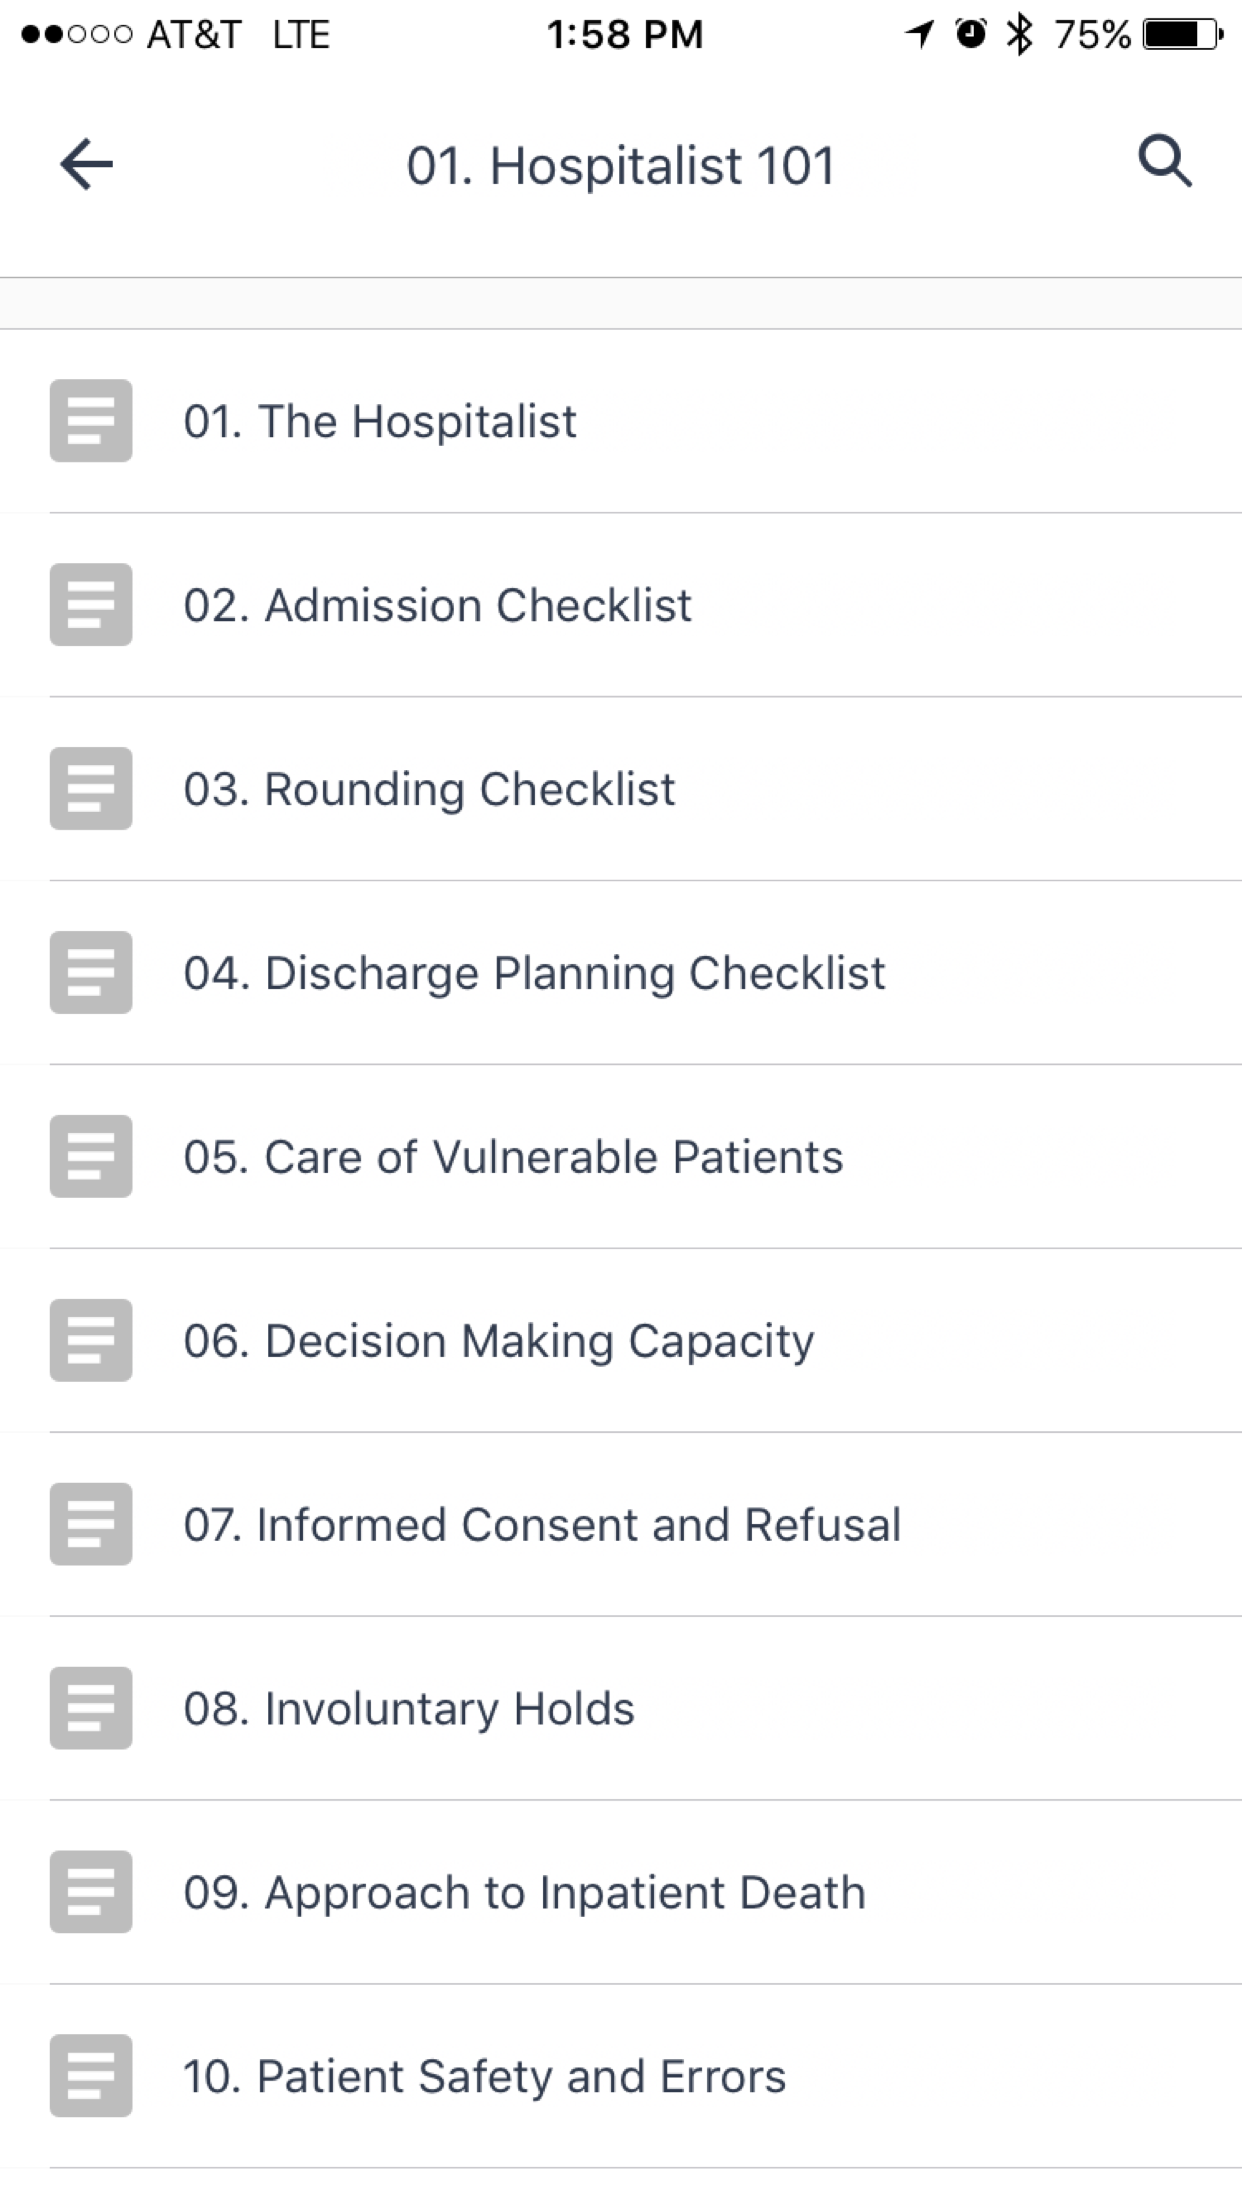 Hospitalist Handbook · AgileMD